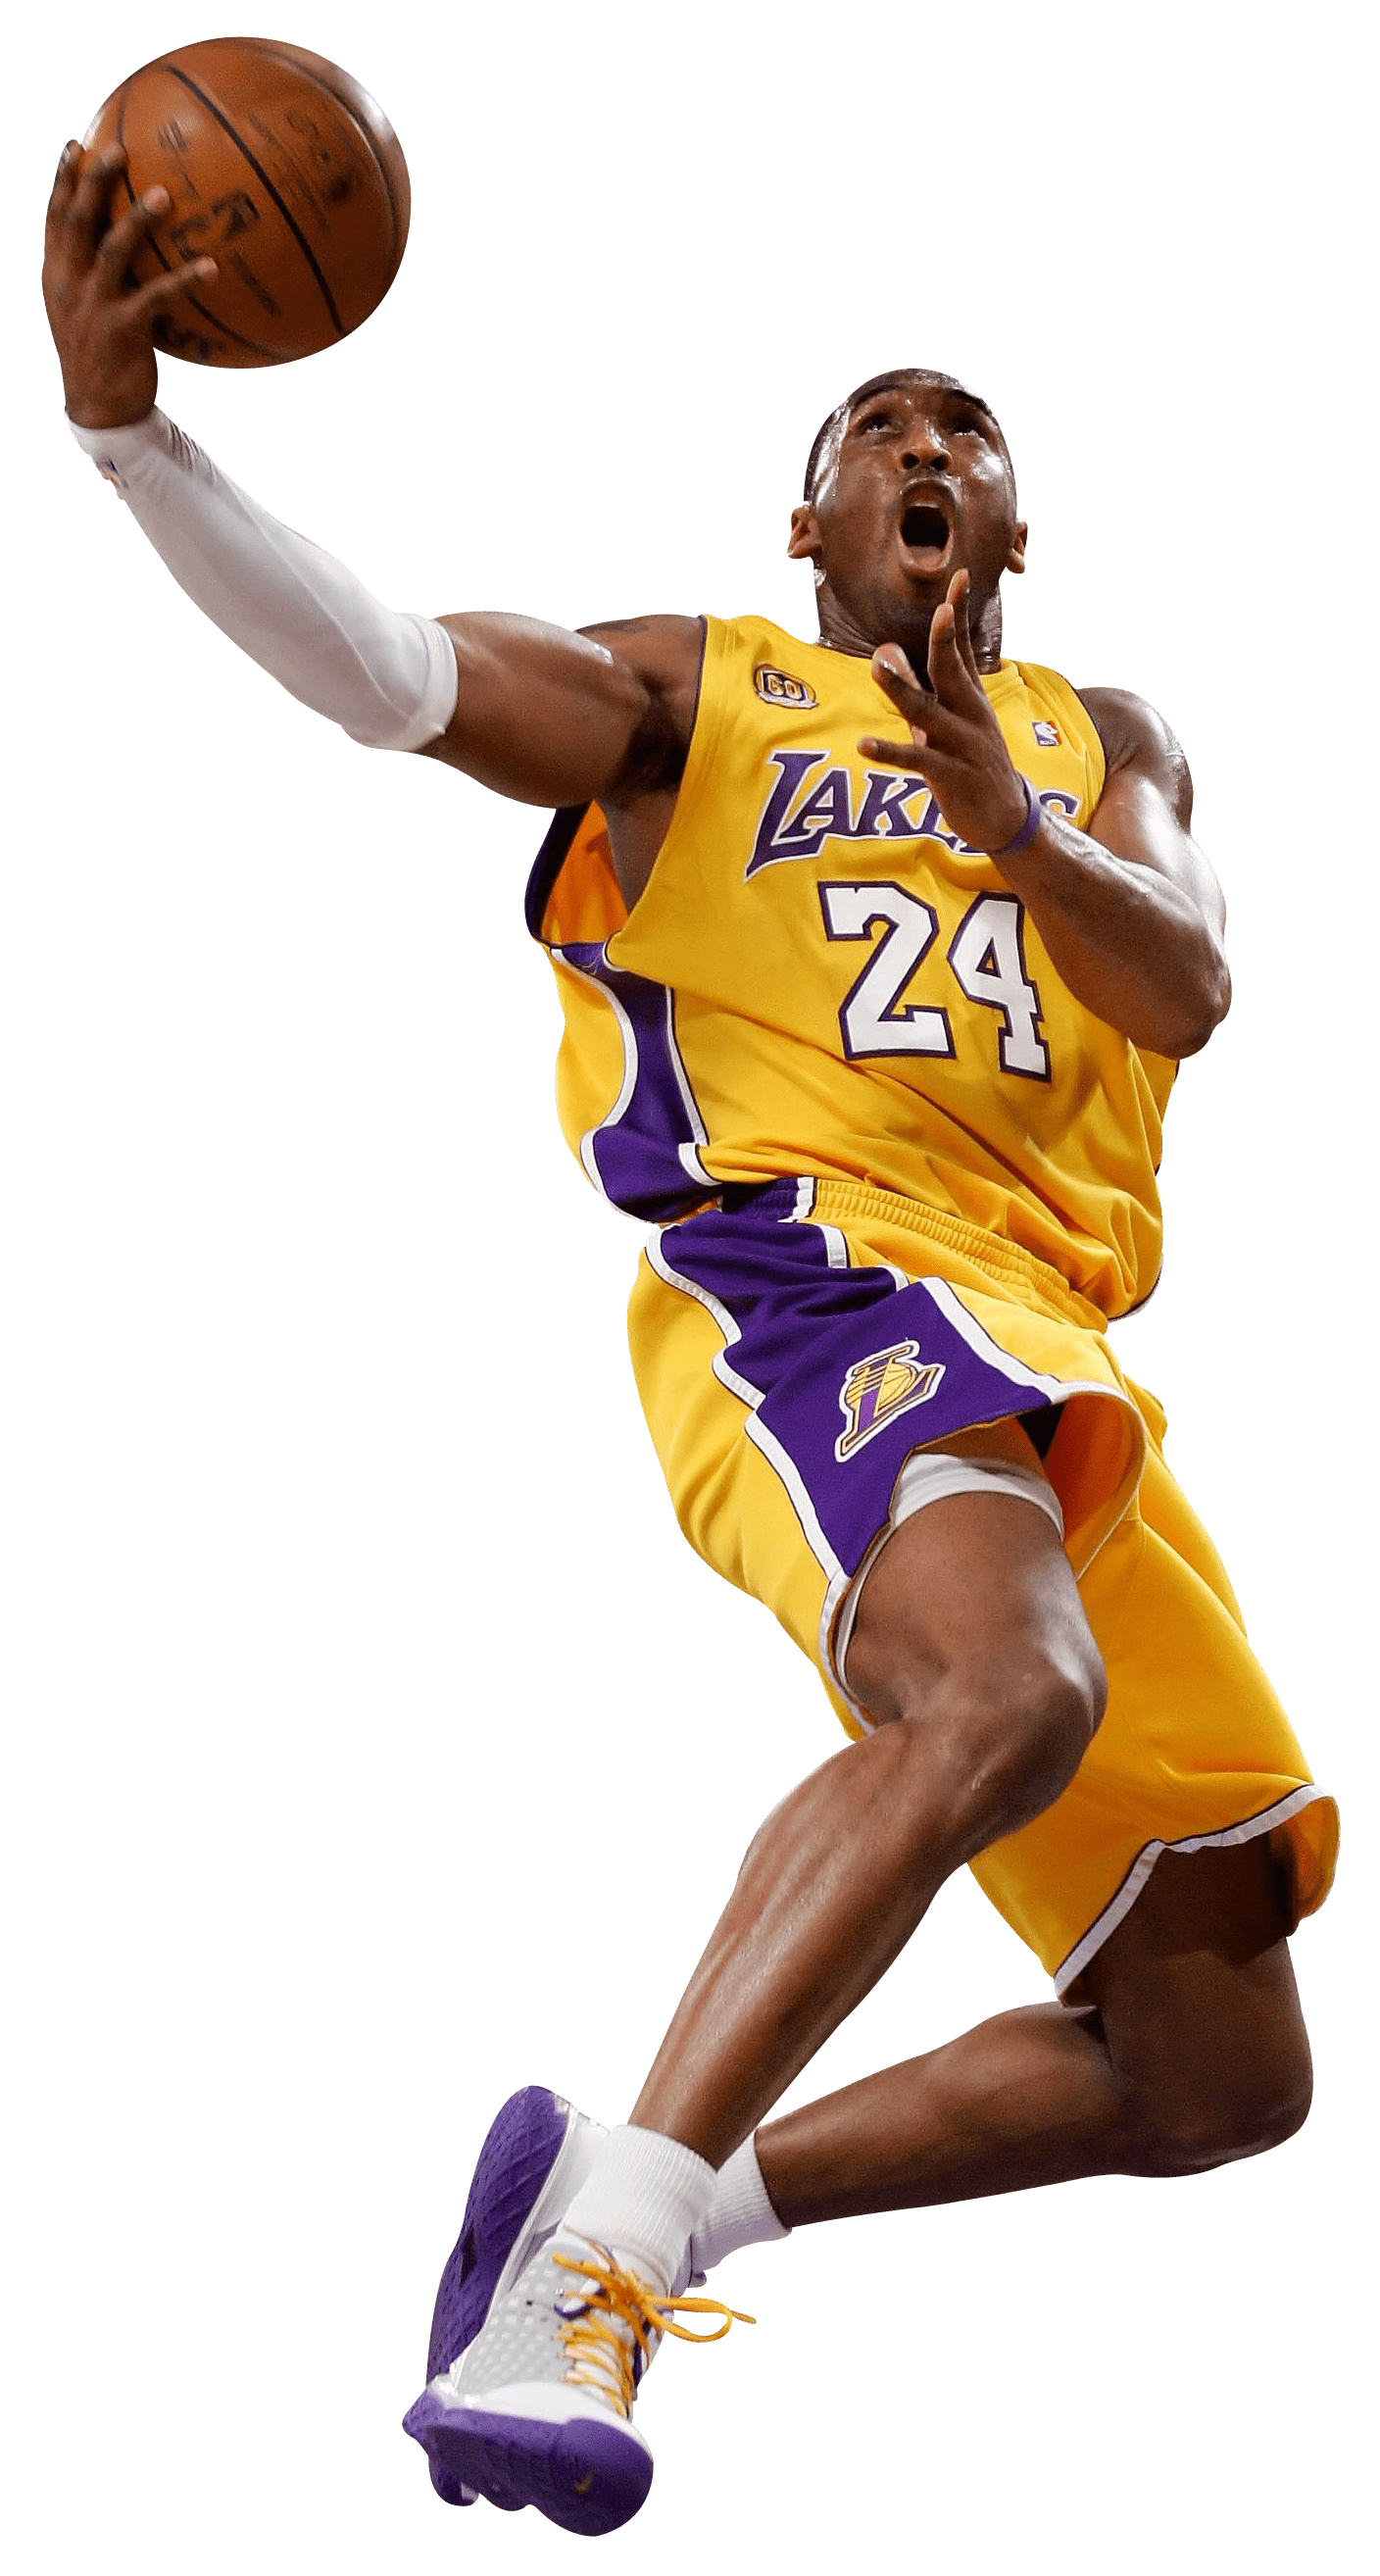 Basketball Players PNG HD - 126863